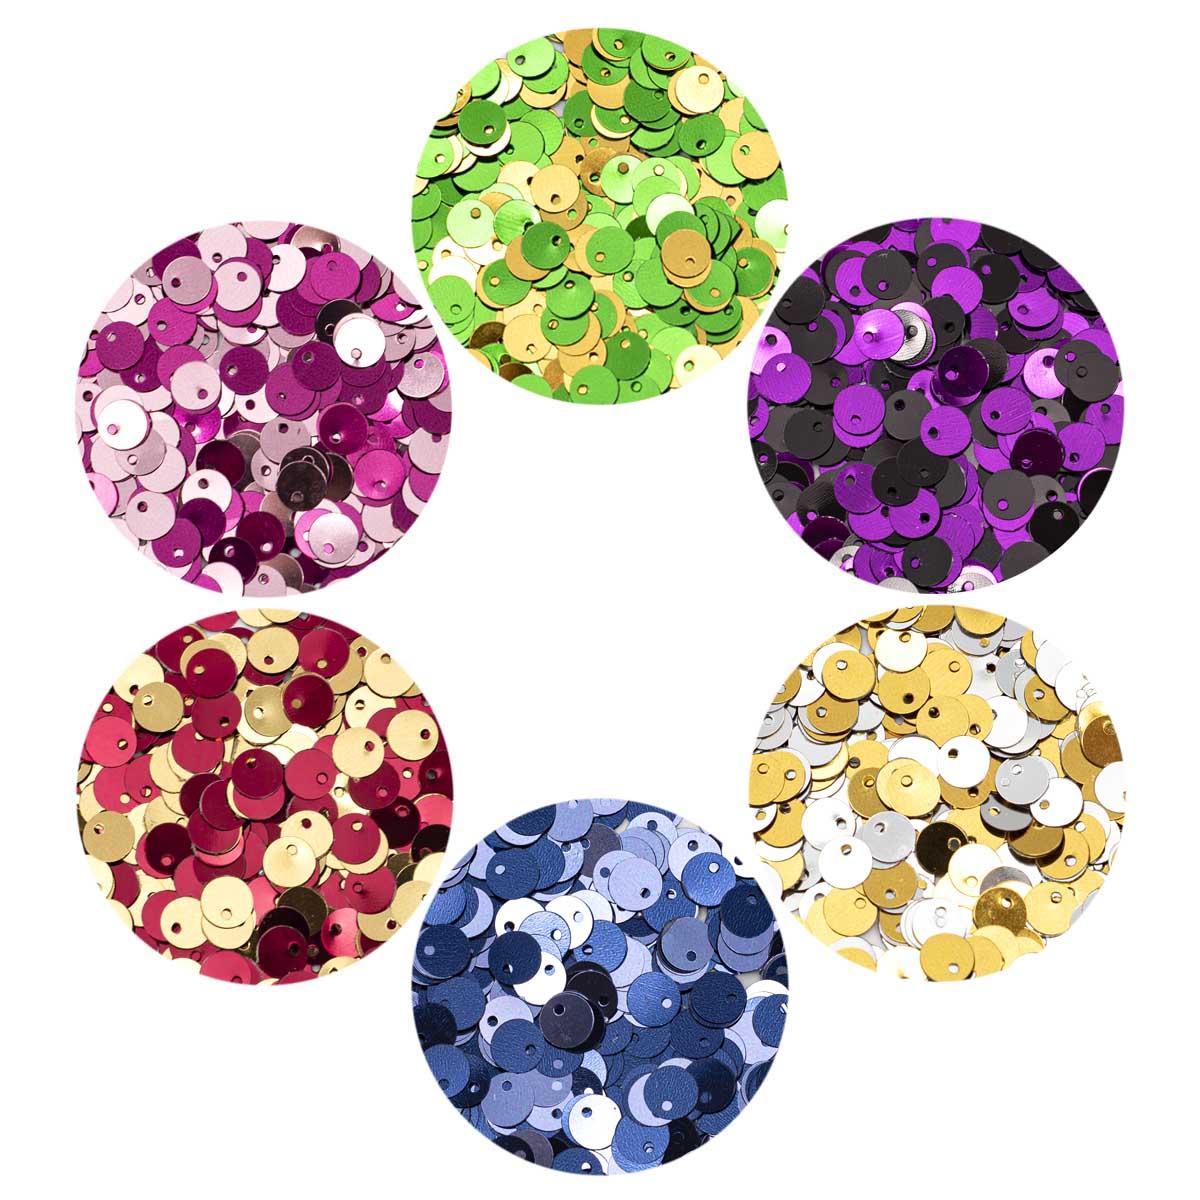 Набор цветных двусторонних пайеток 6мм, 6 цветов по 10гр, Астра